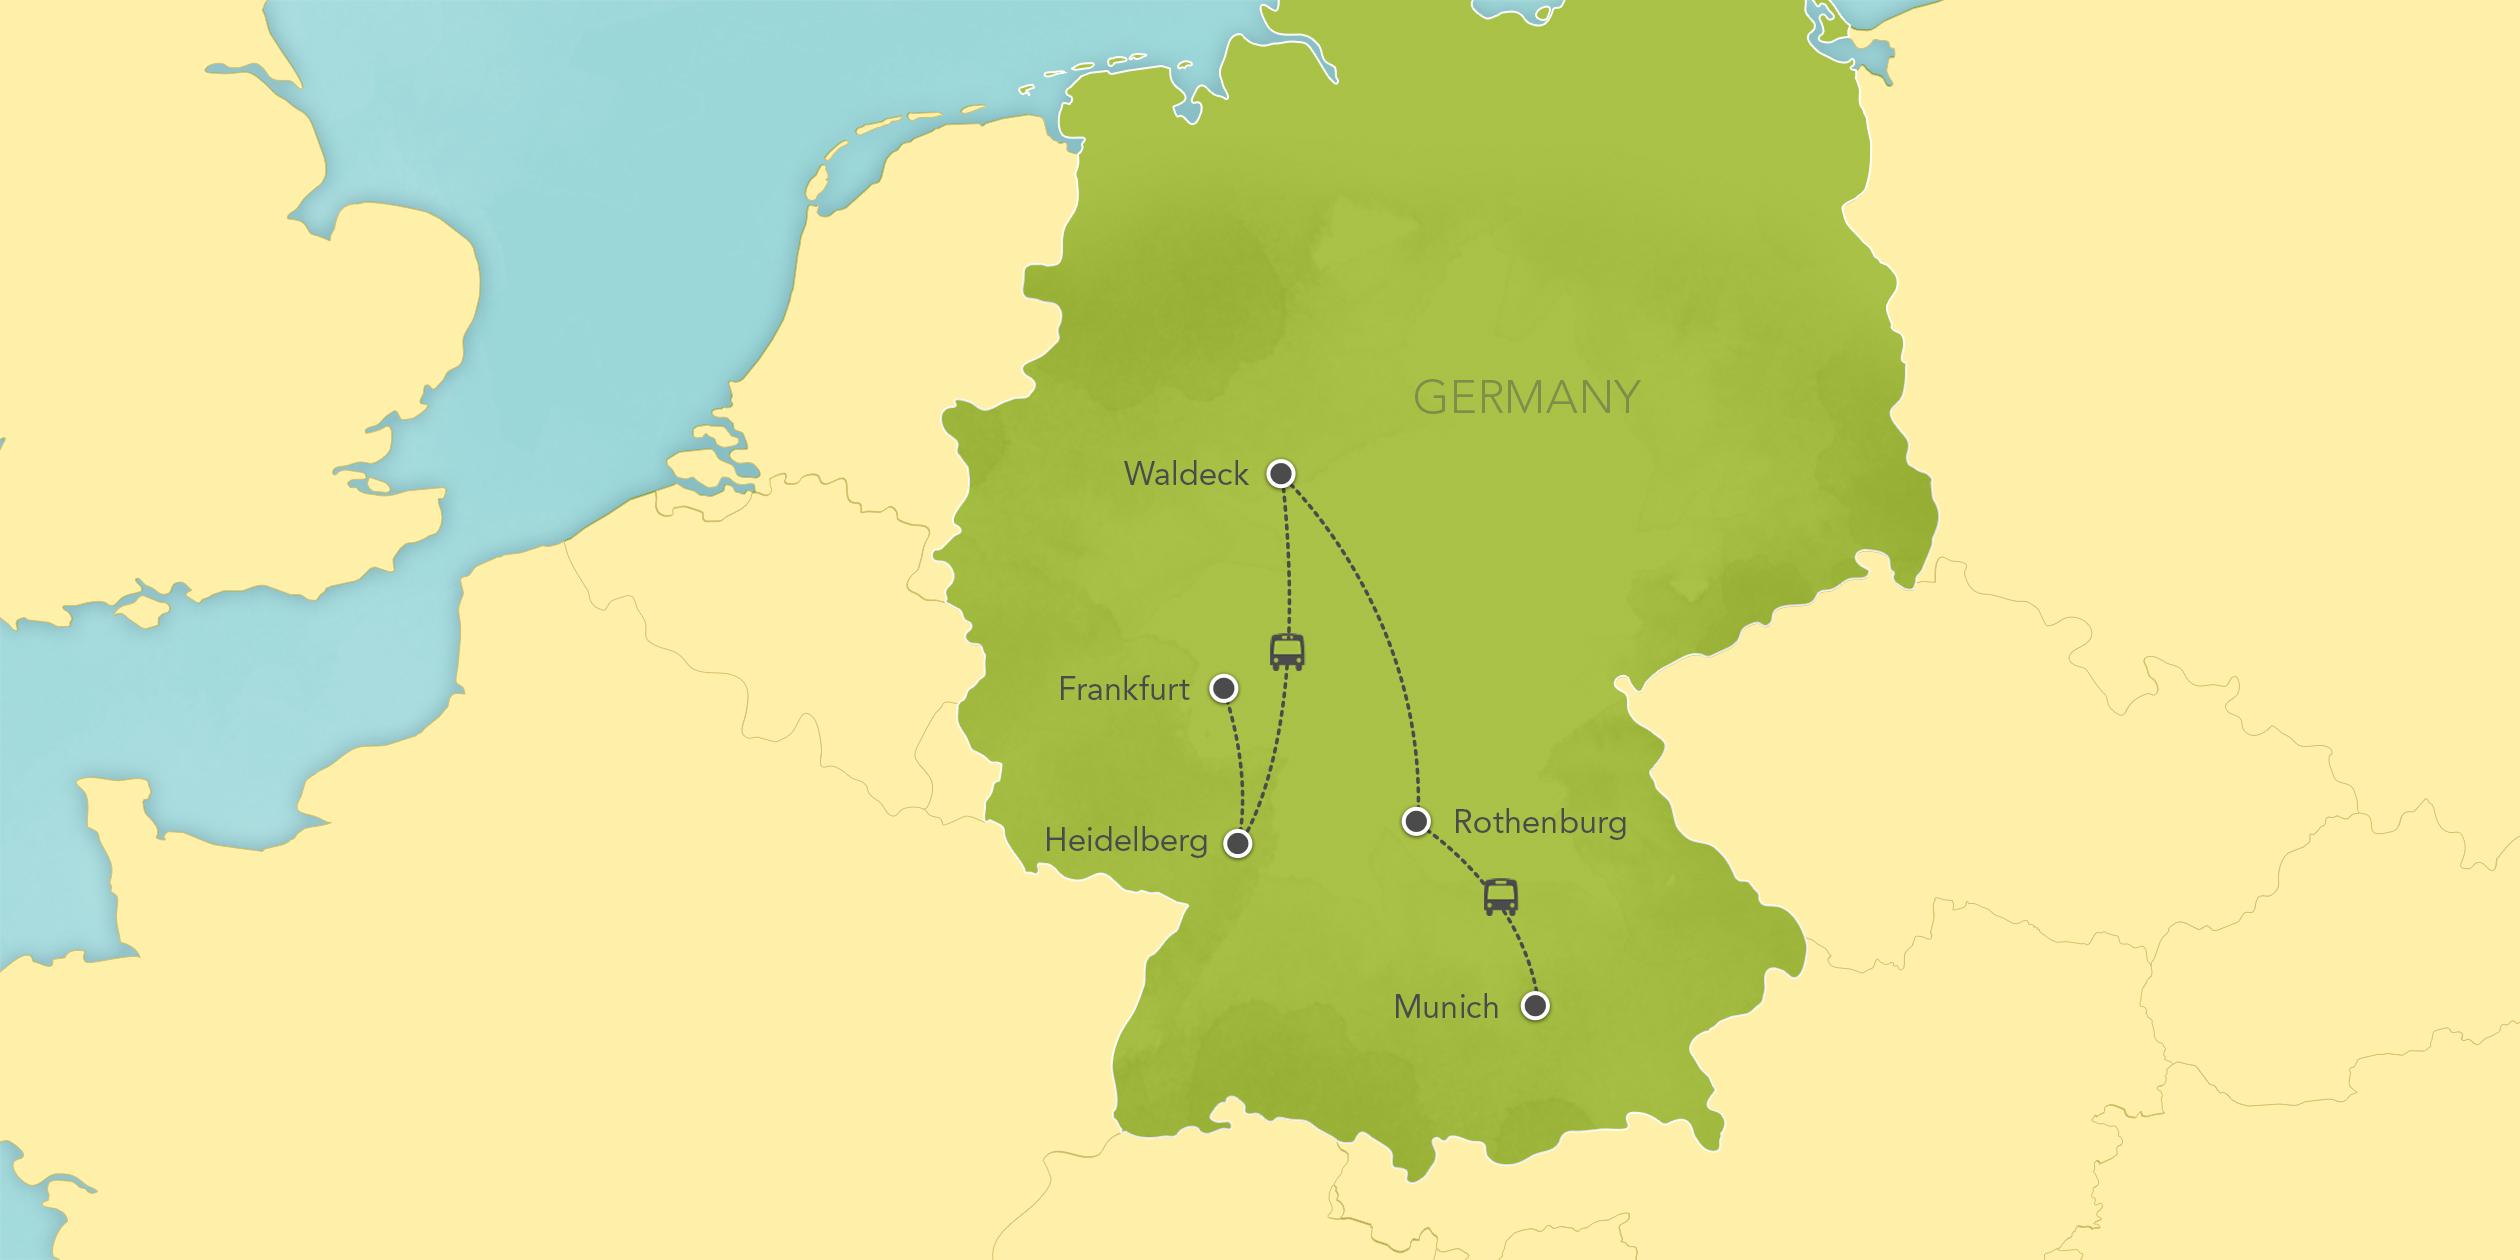 Itinerary map of Germany: Heidelberg, Waldeck, Rothenburg, Munich 2017